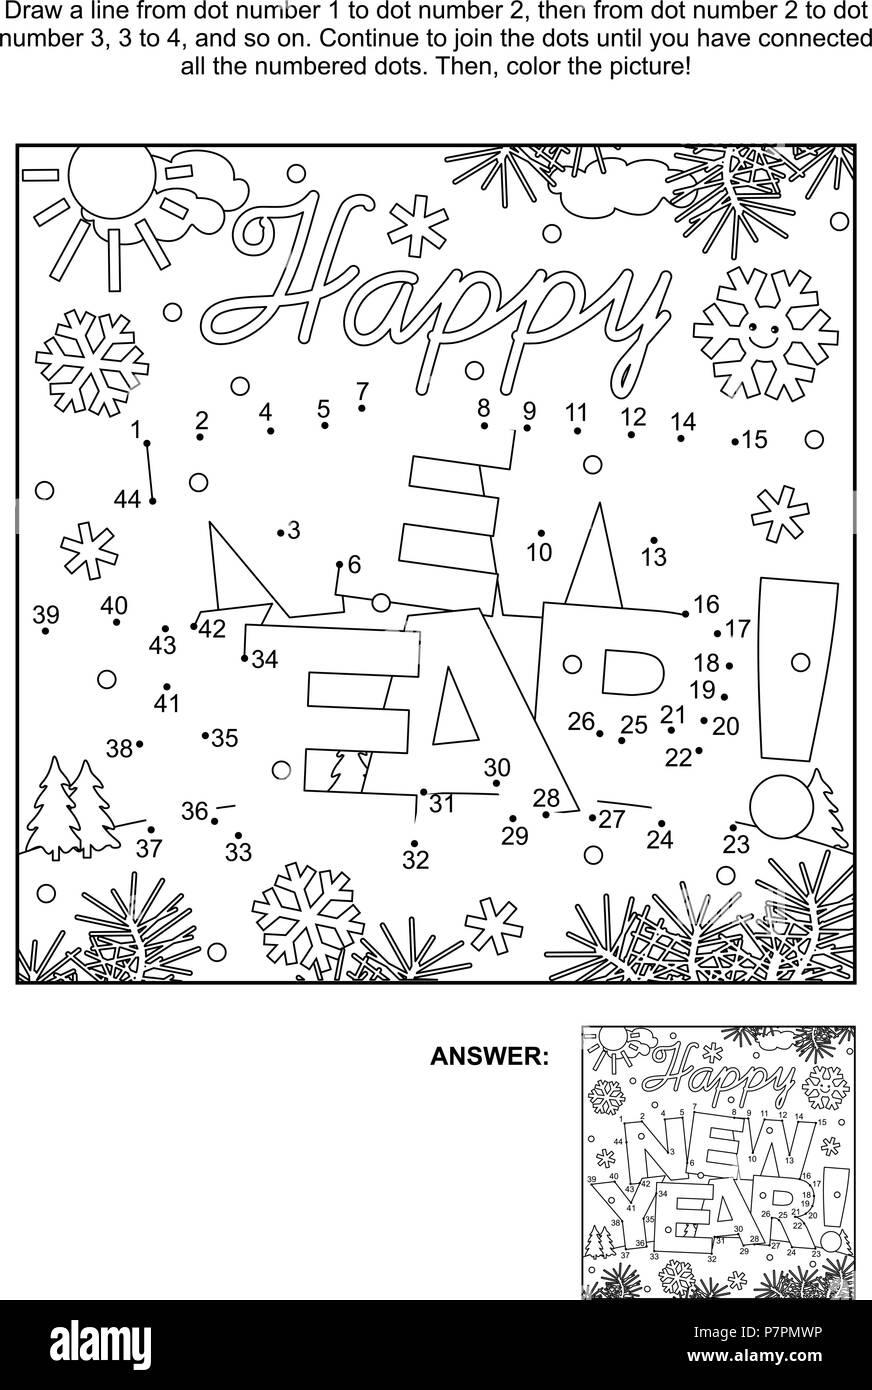 Winter Coloring Stockfotos & Winter Coloring Bilder - Seite 3 - Alamy